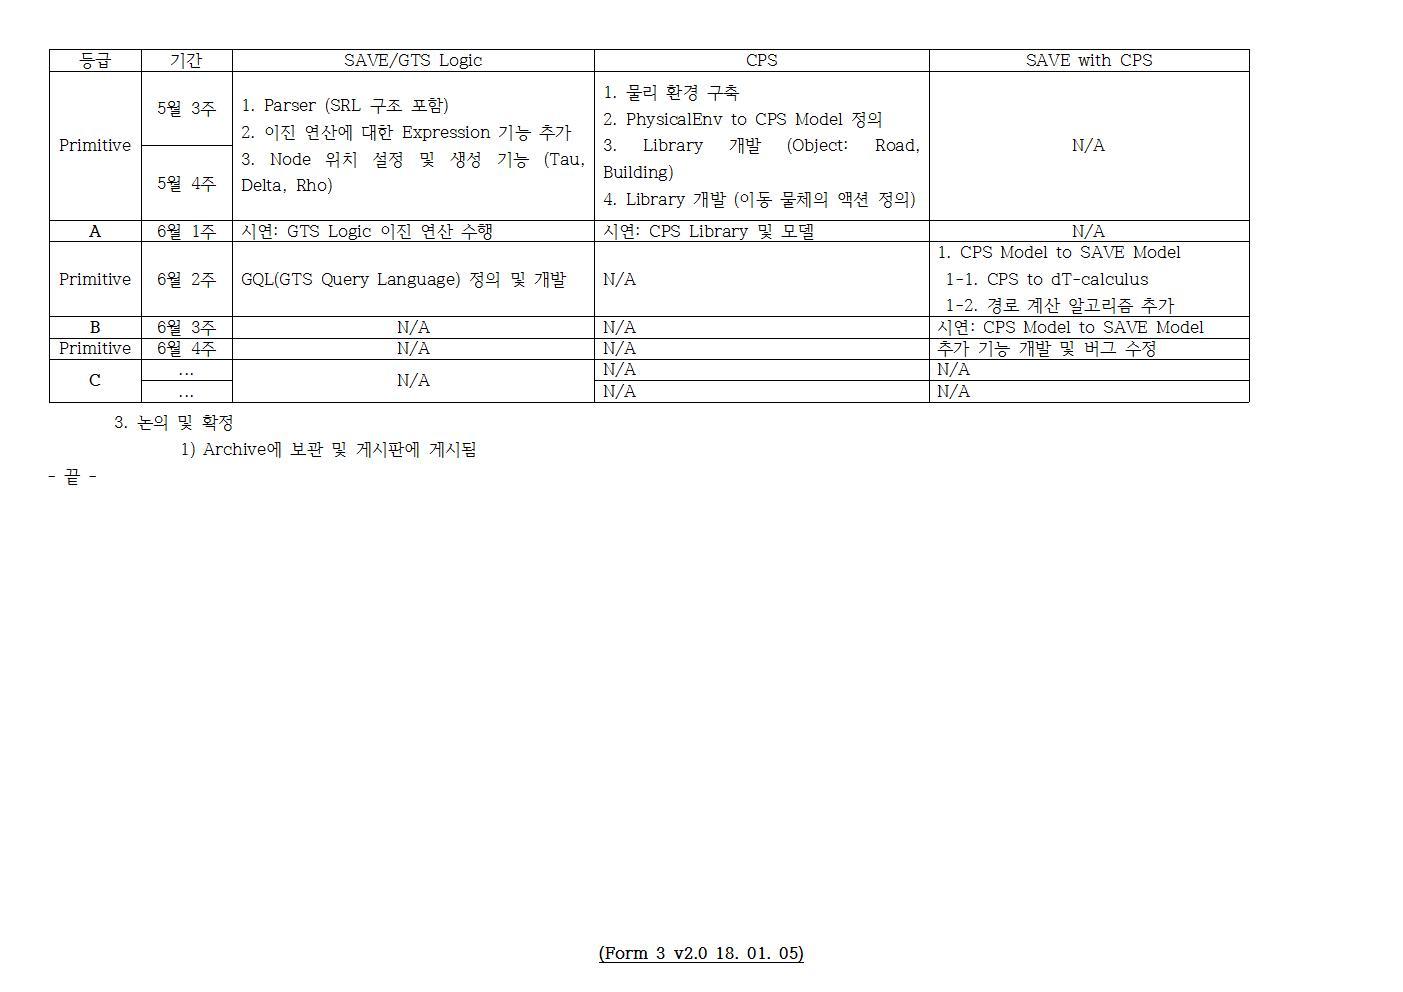 D-[18-037-RC-07]-[3L-CPS]-[2018-05-18][SH]003.jpg